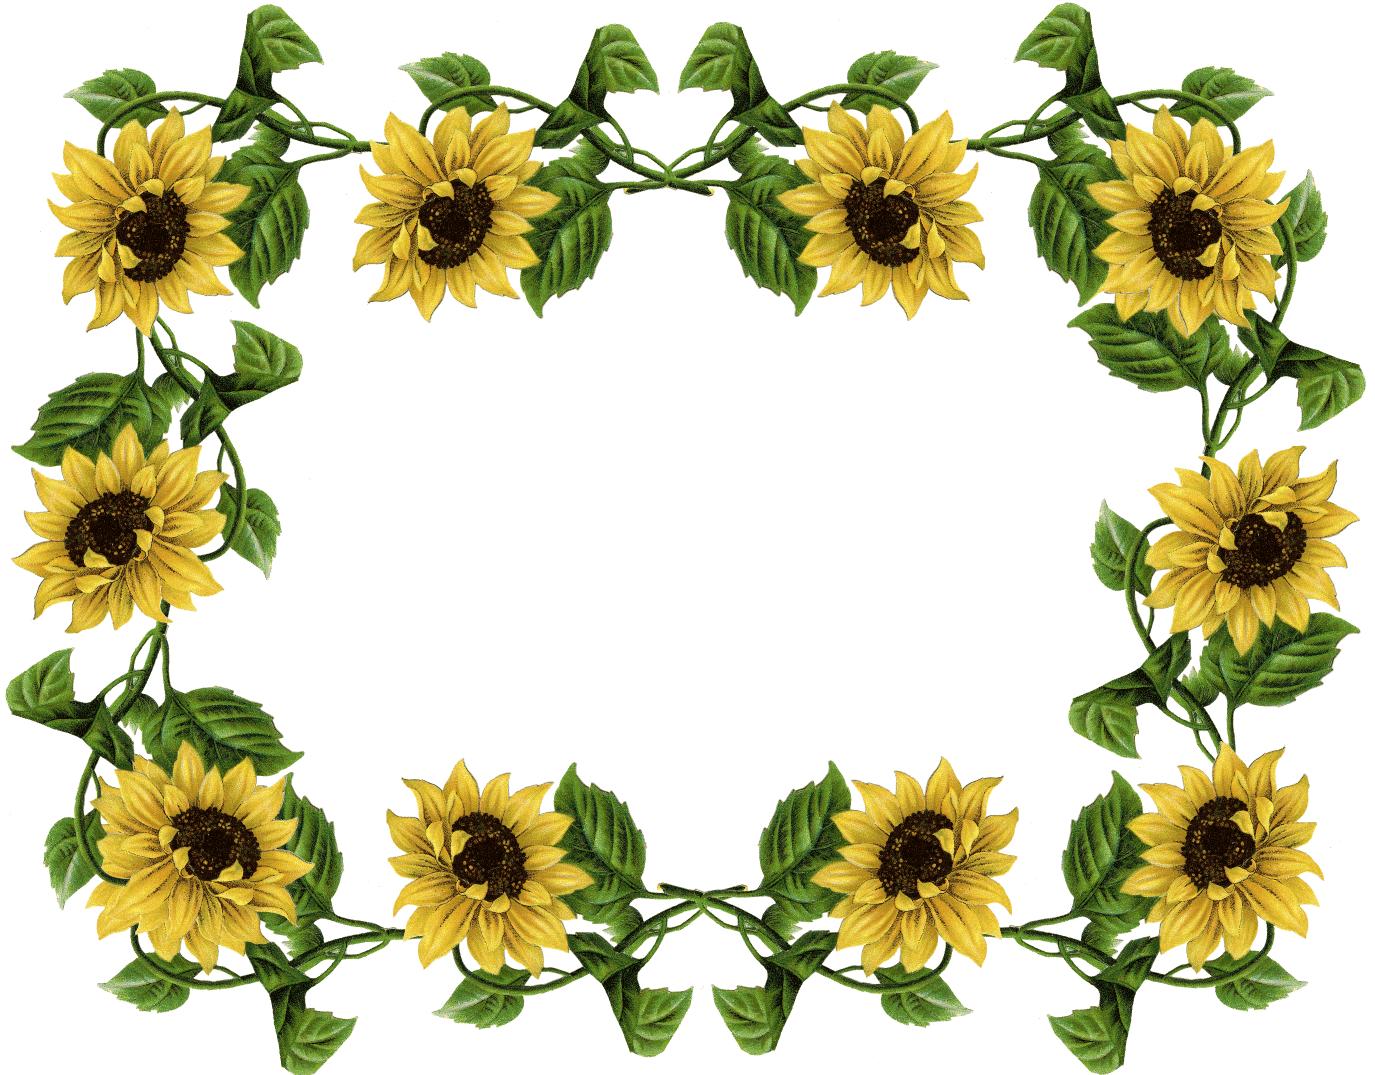 Garden clipart sunflower. Border jokingart com download